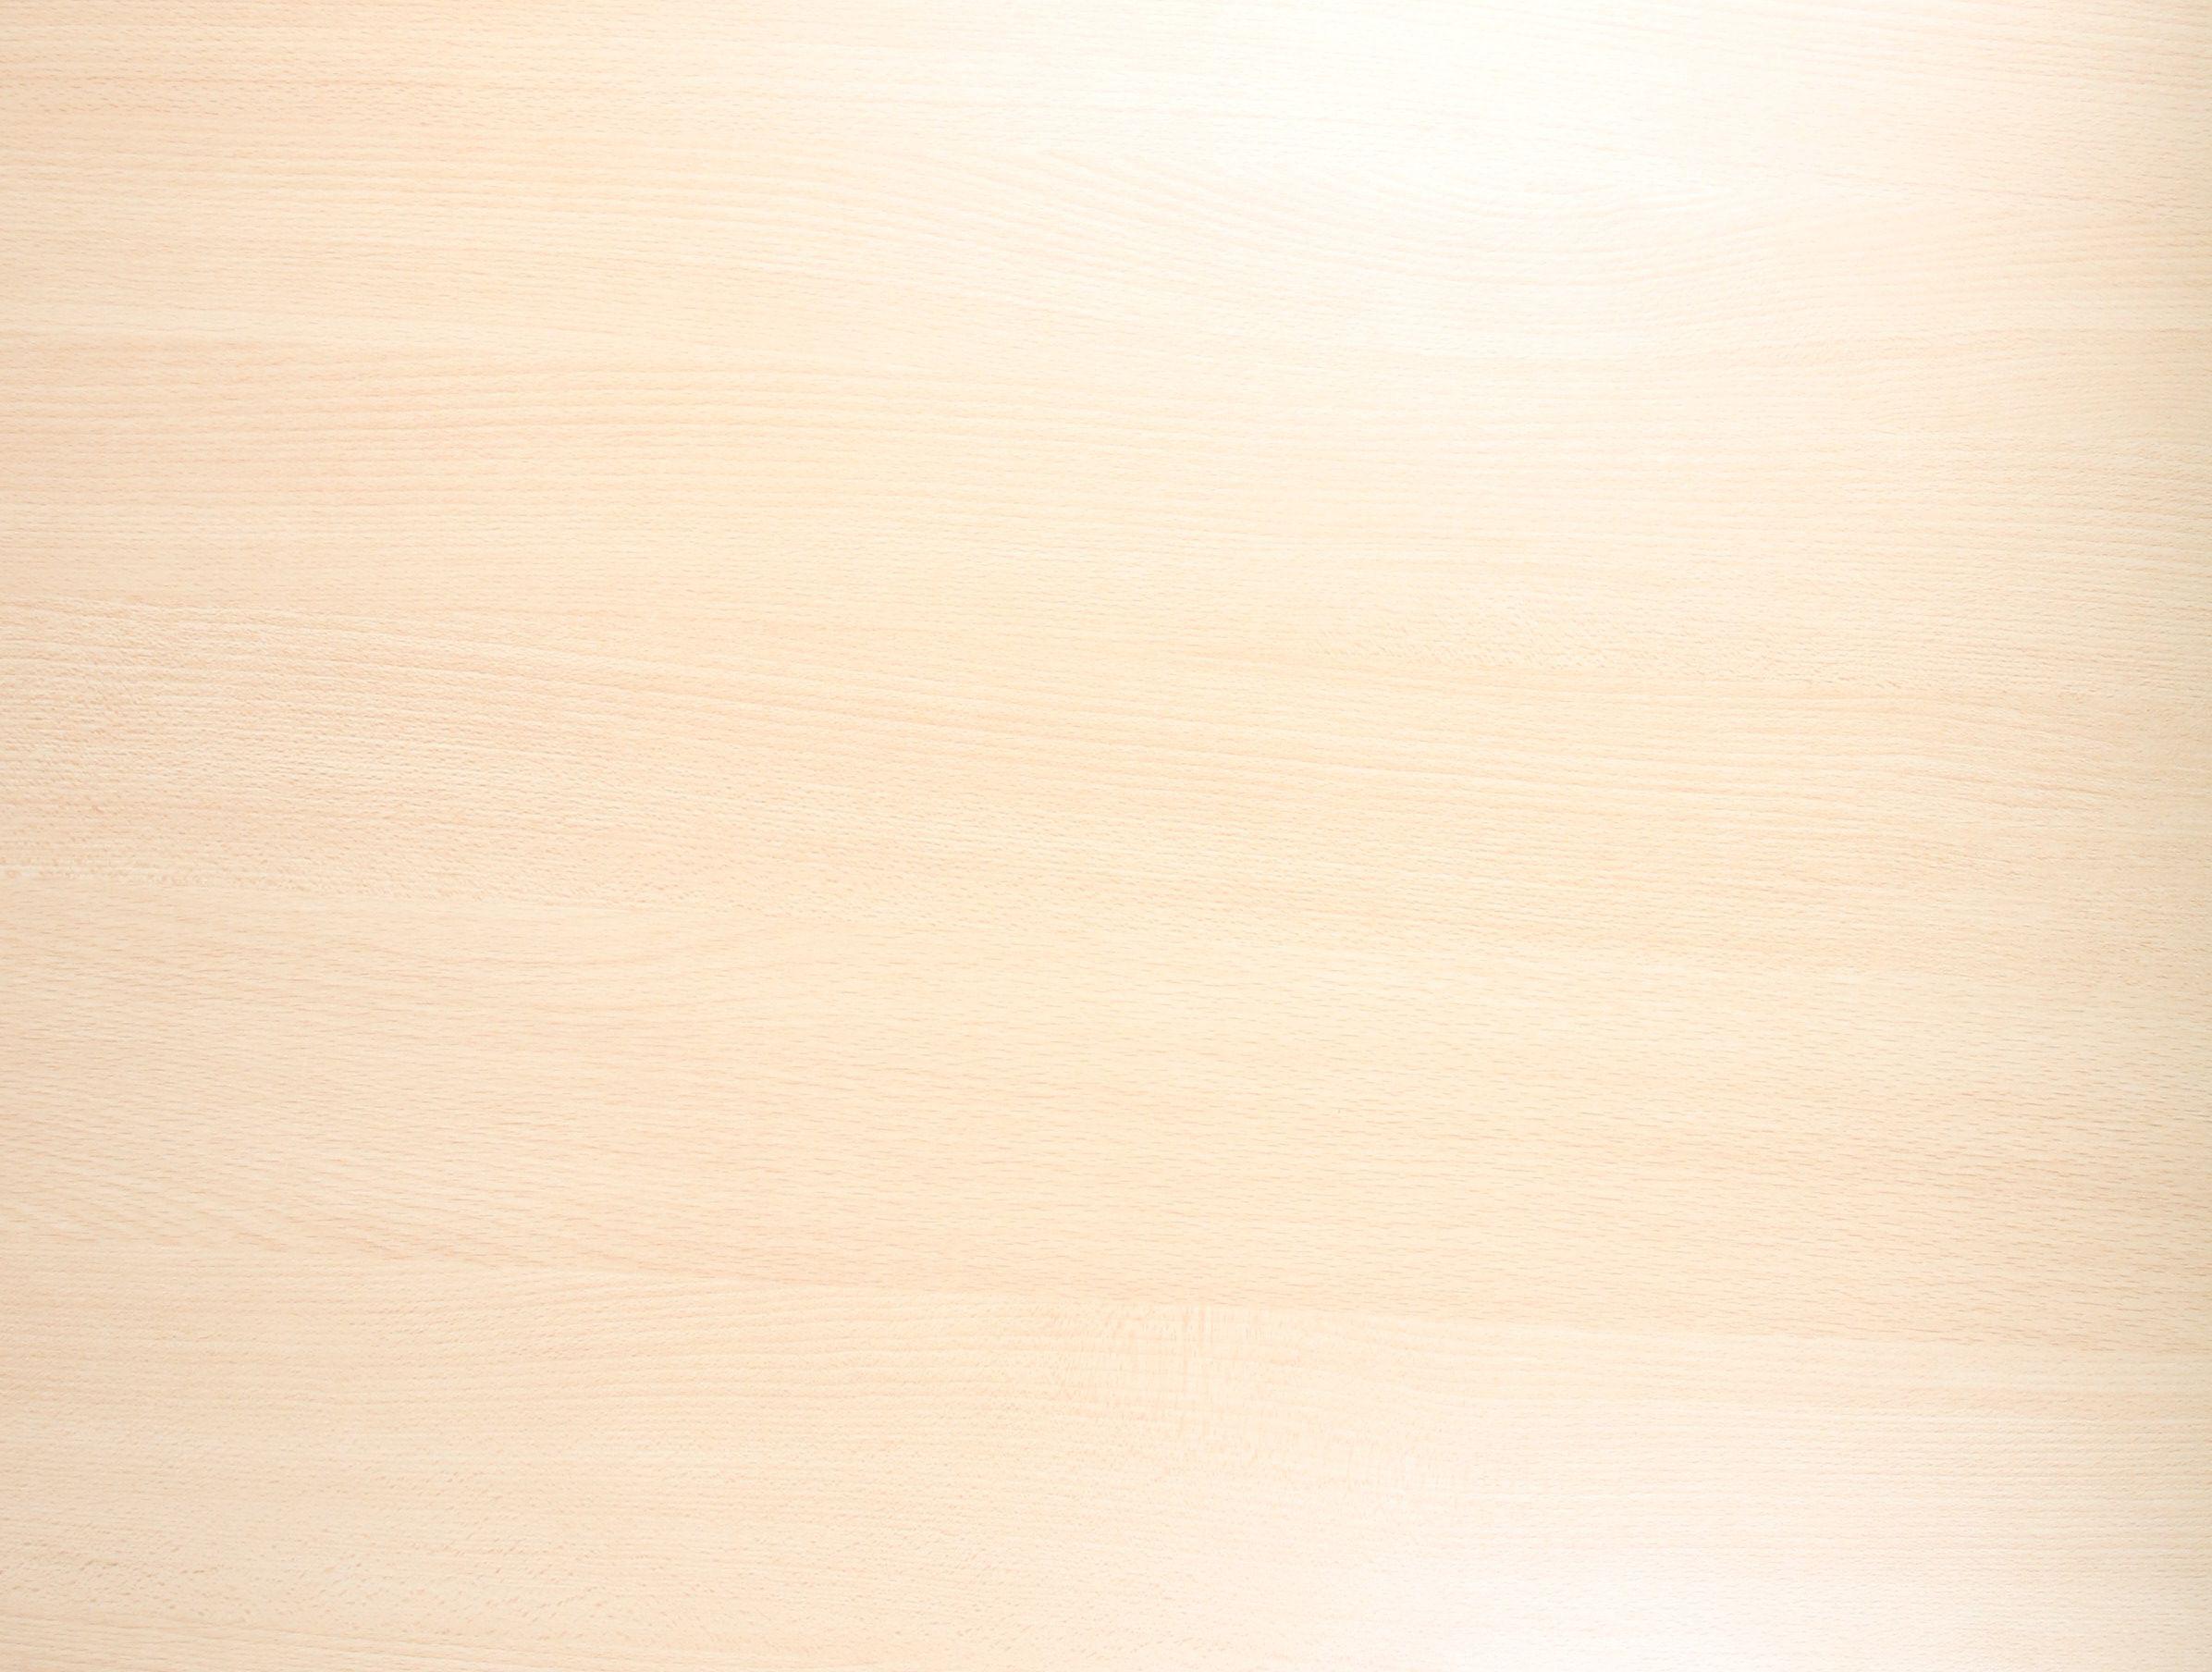 Glitter Live Wallpaper Iphone X Fond Texture Bois Beige Background Color Wallpaper